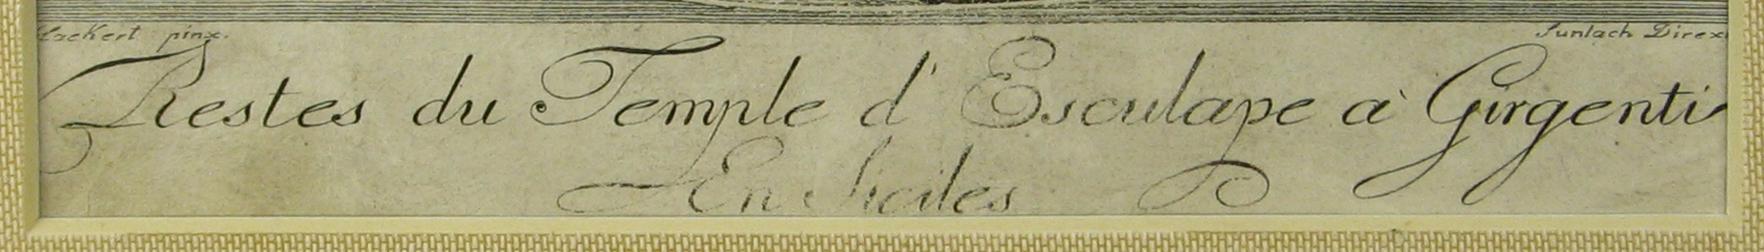 101-12s.jpg (1764×252)